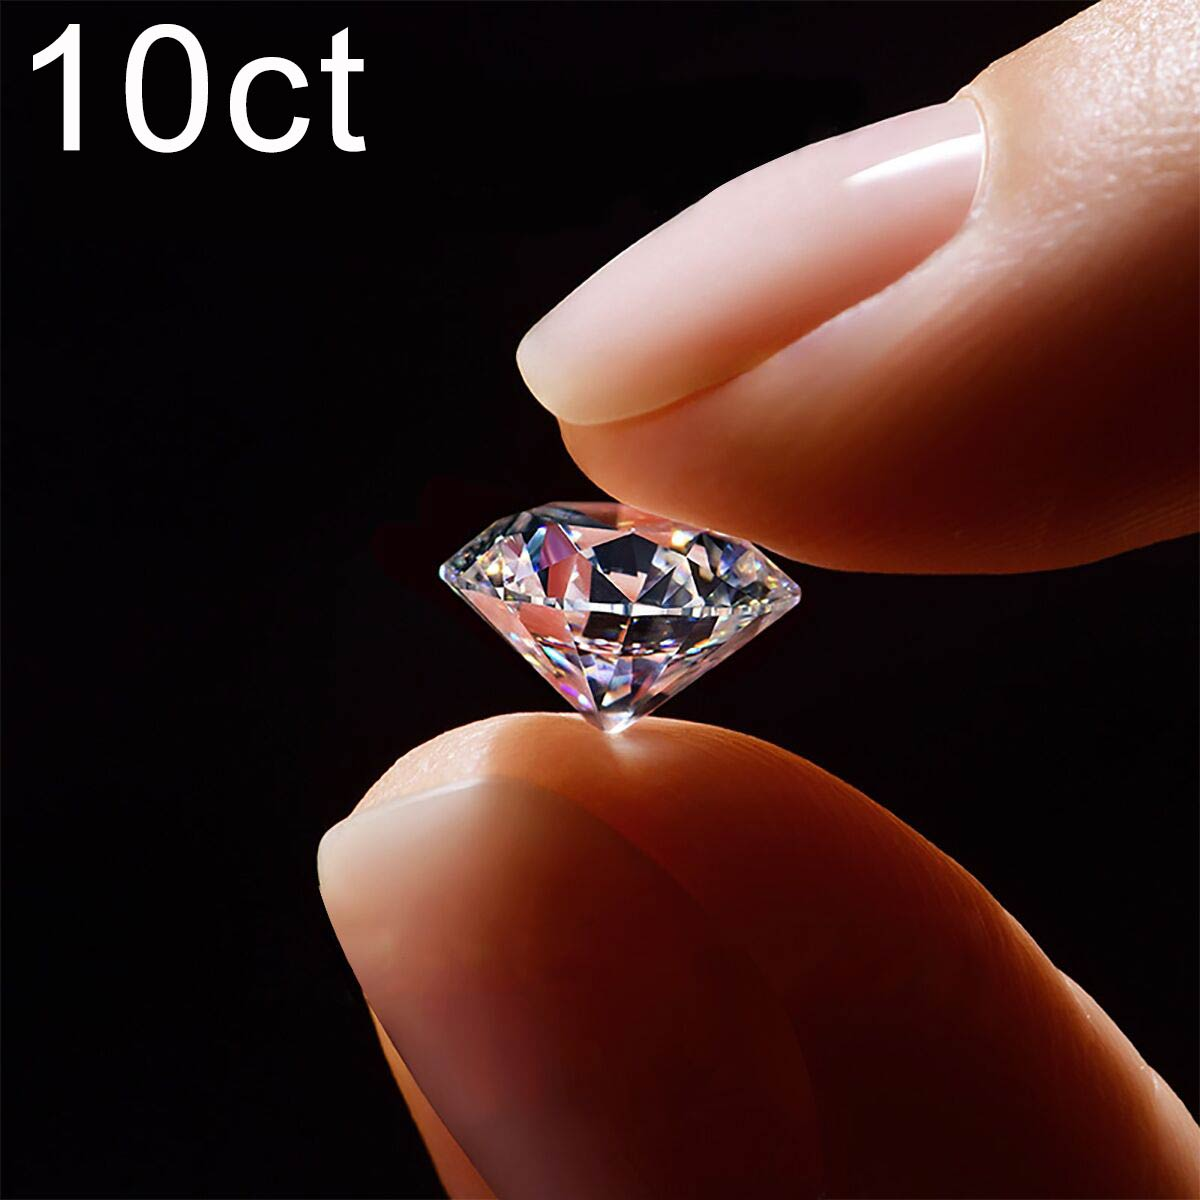 10ct 14 مللي متر D اللون VVS1 100% ريال فضفاض الأحجار الكريمة مويسانيت حجر CVD الماس مختبر مع شهادة GRA للنساء خاتم مجوهرات